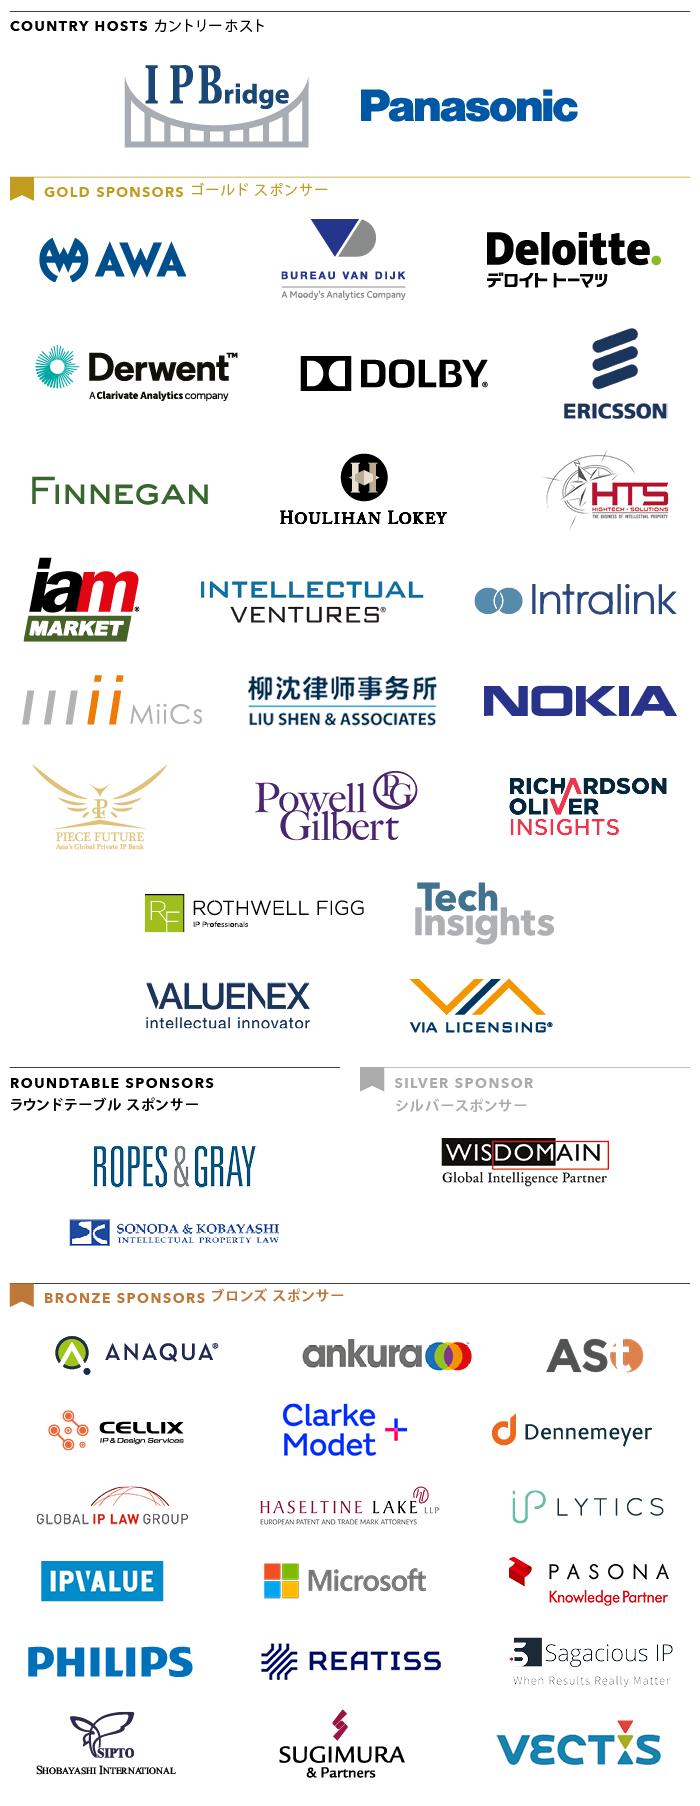 DD-IPD-616-IPBC-Asia-2019-sponsor-image-V24